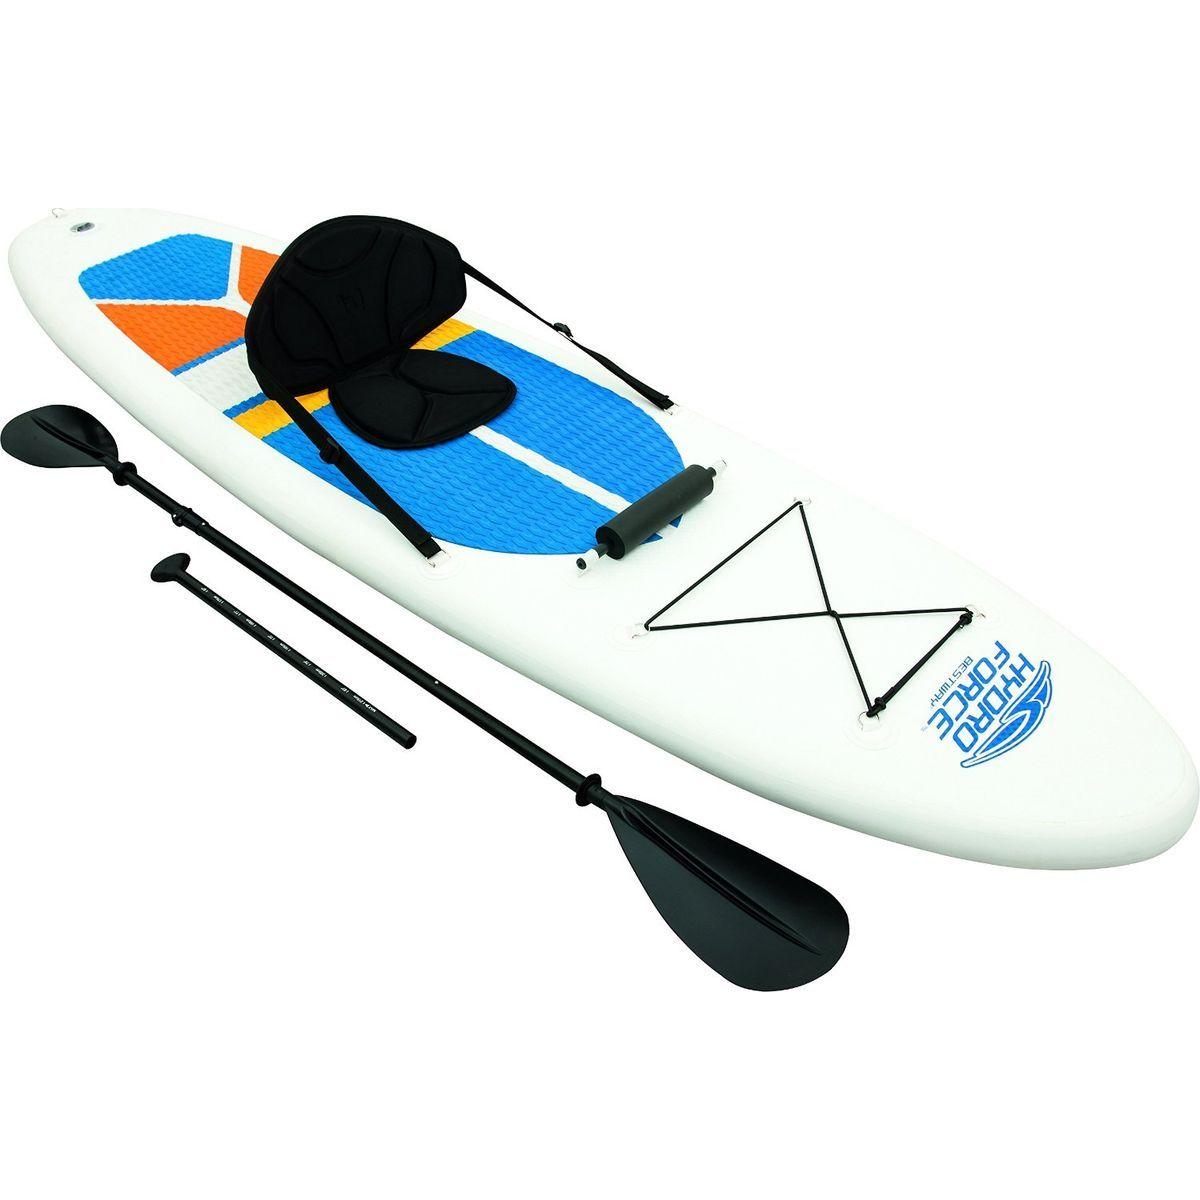 Bestway Paddle White Cap SUP 305x81x10cm